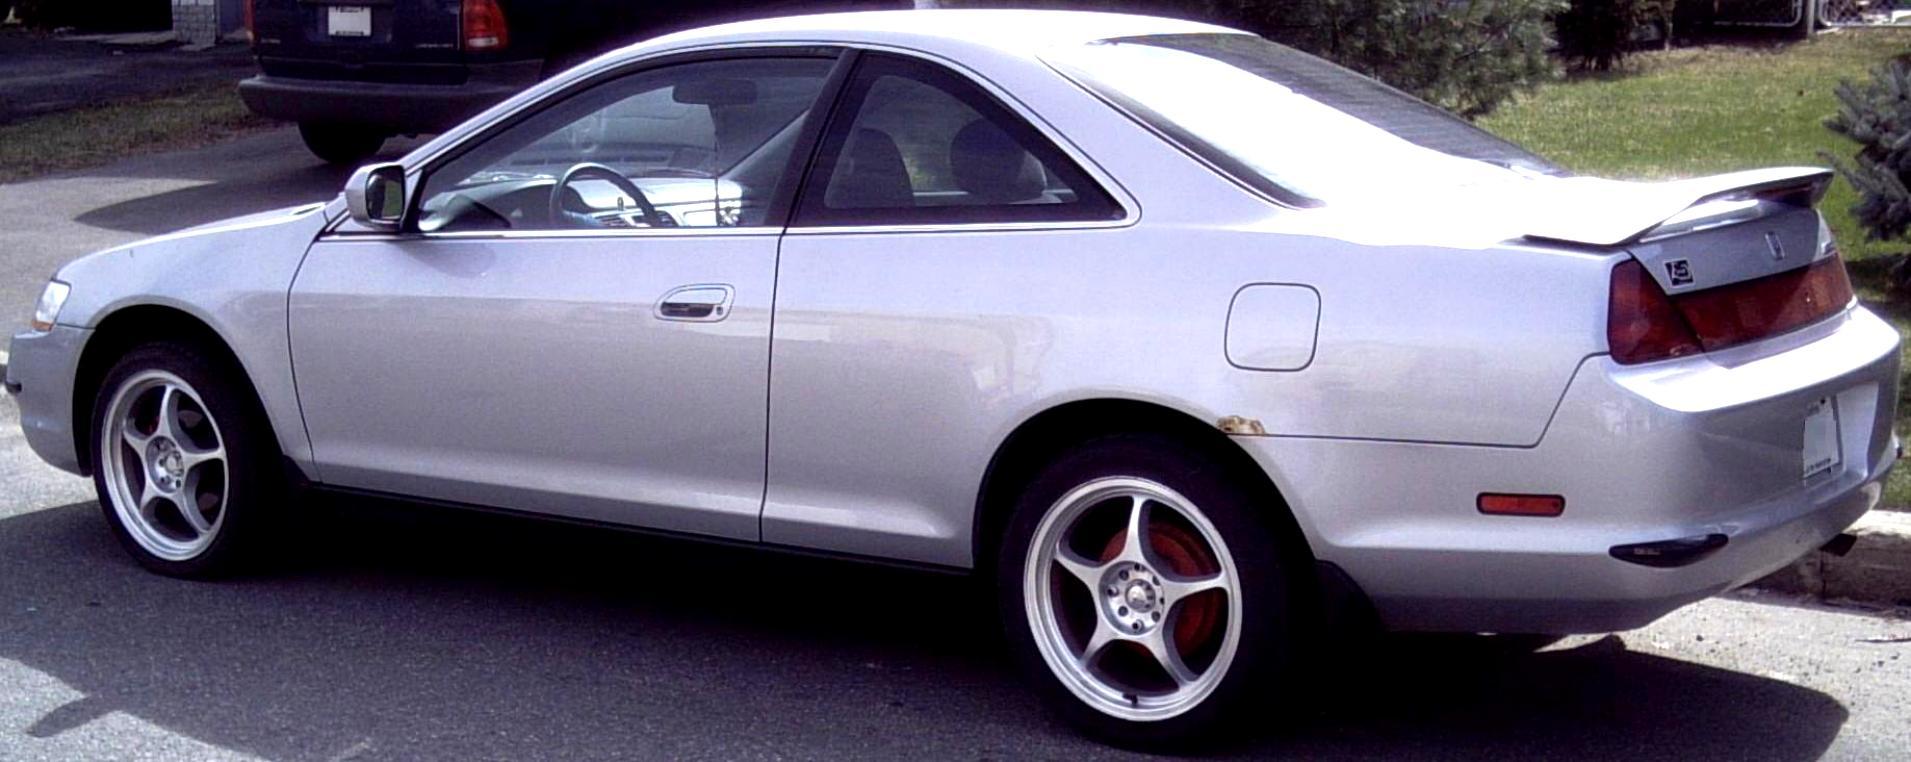 honda accord coupe 1998